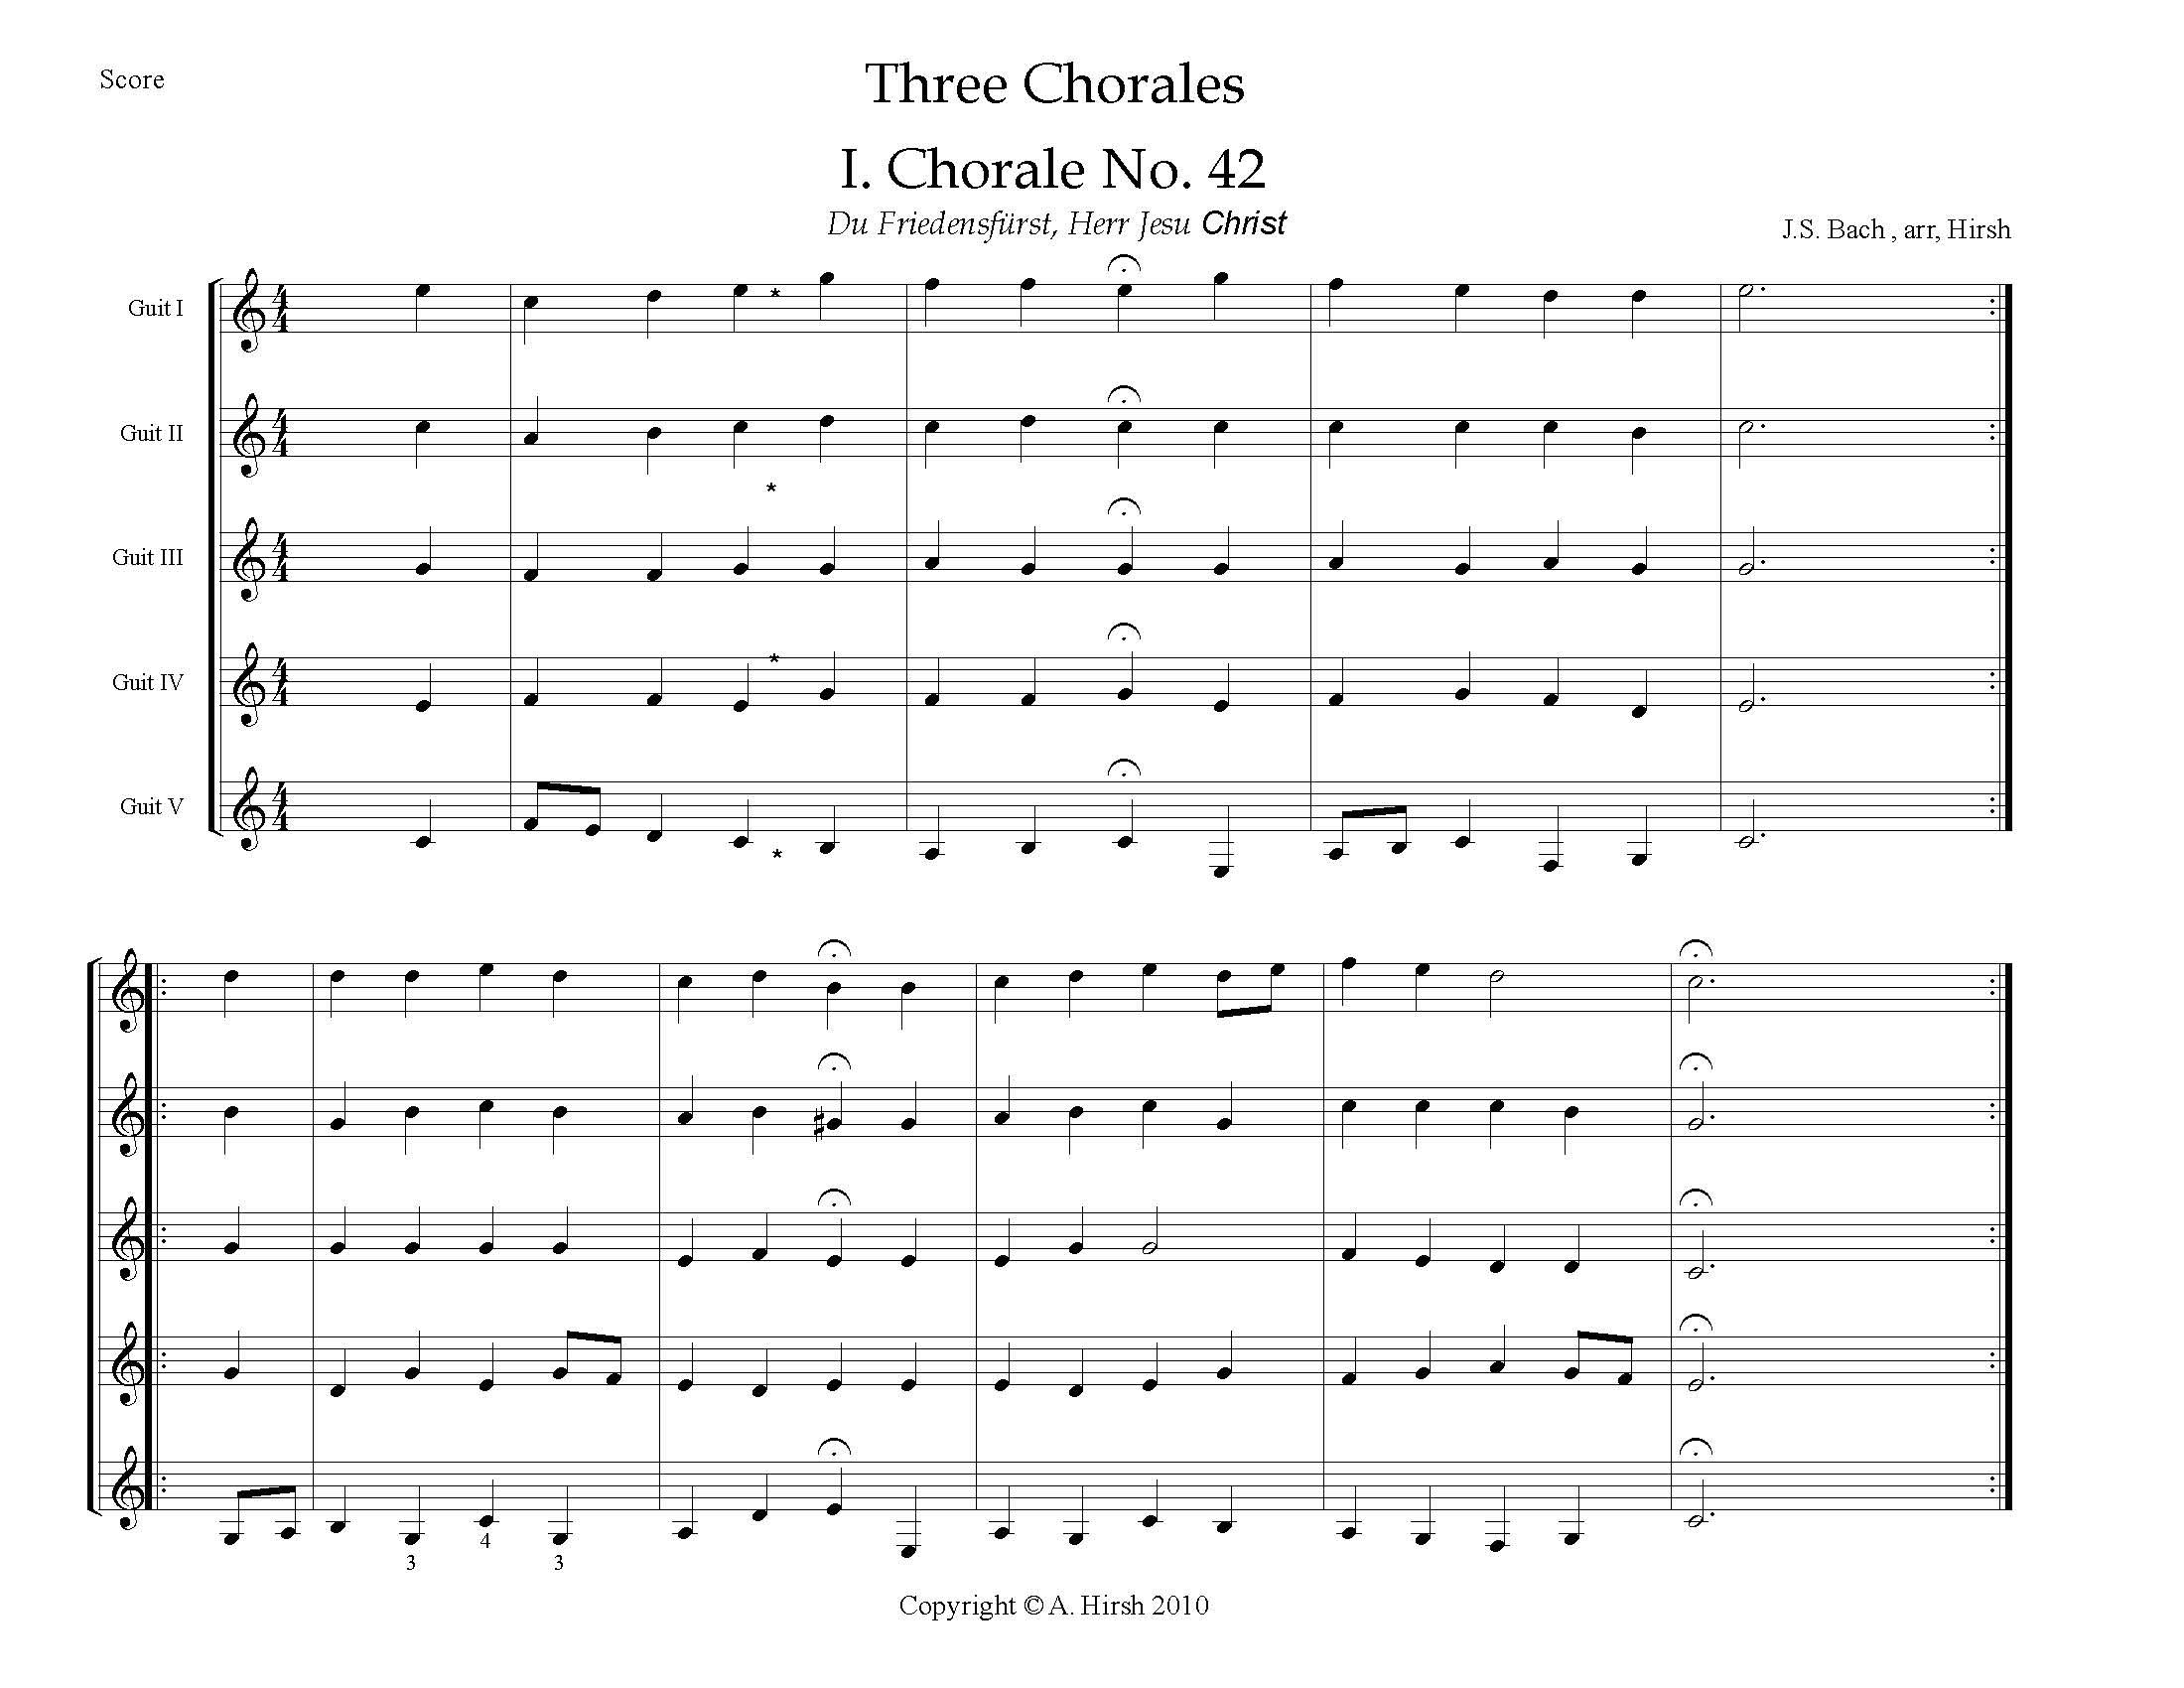 Three Chorales by J.S. Bach (E)